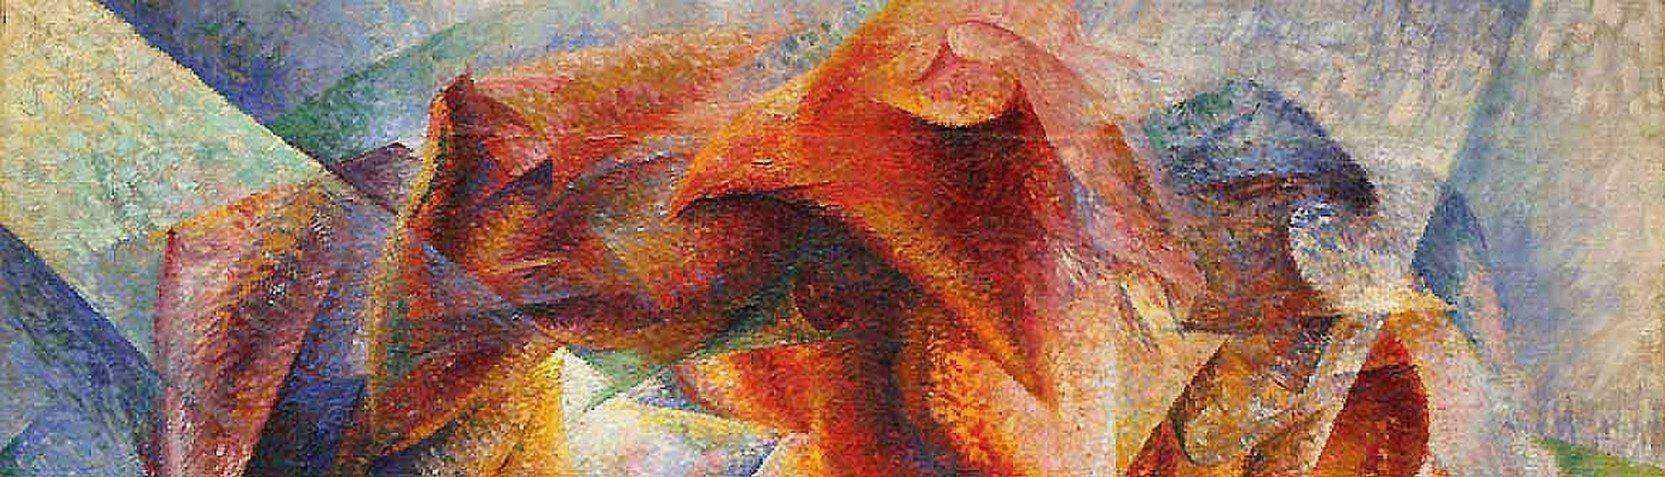 Artyści - Umberto Boccioni